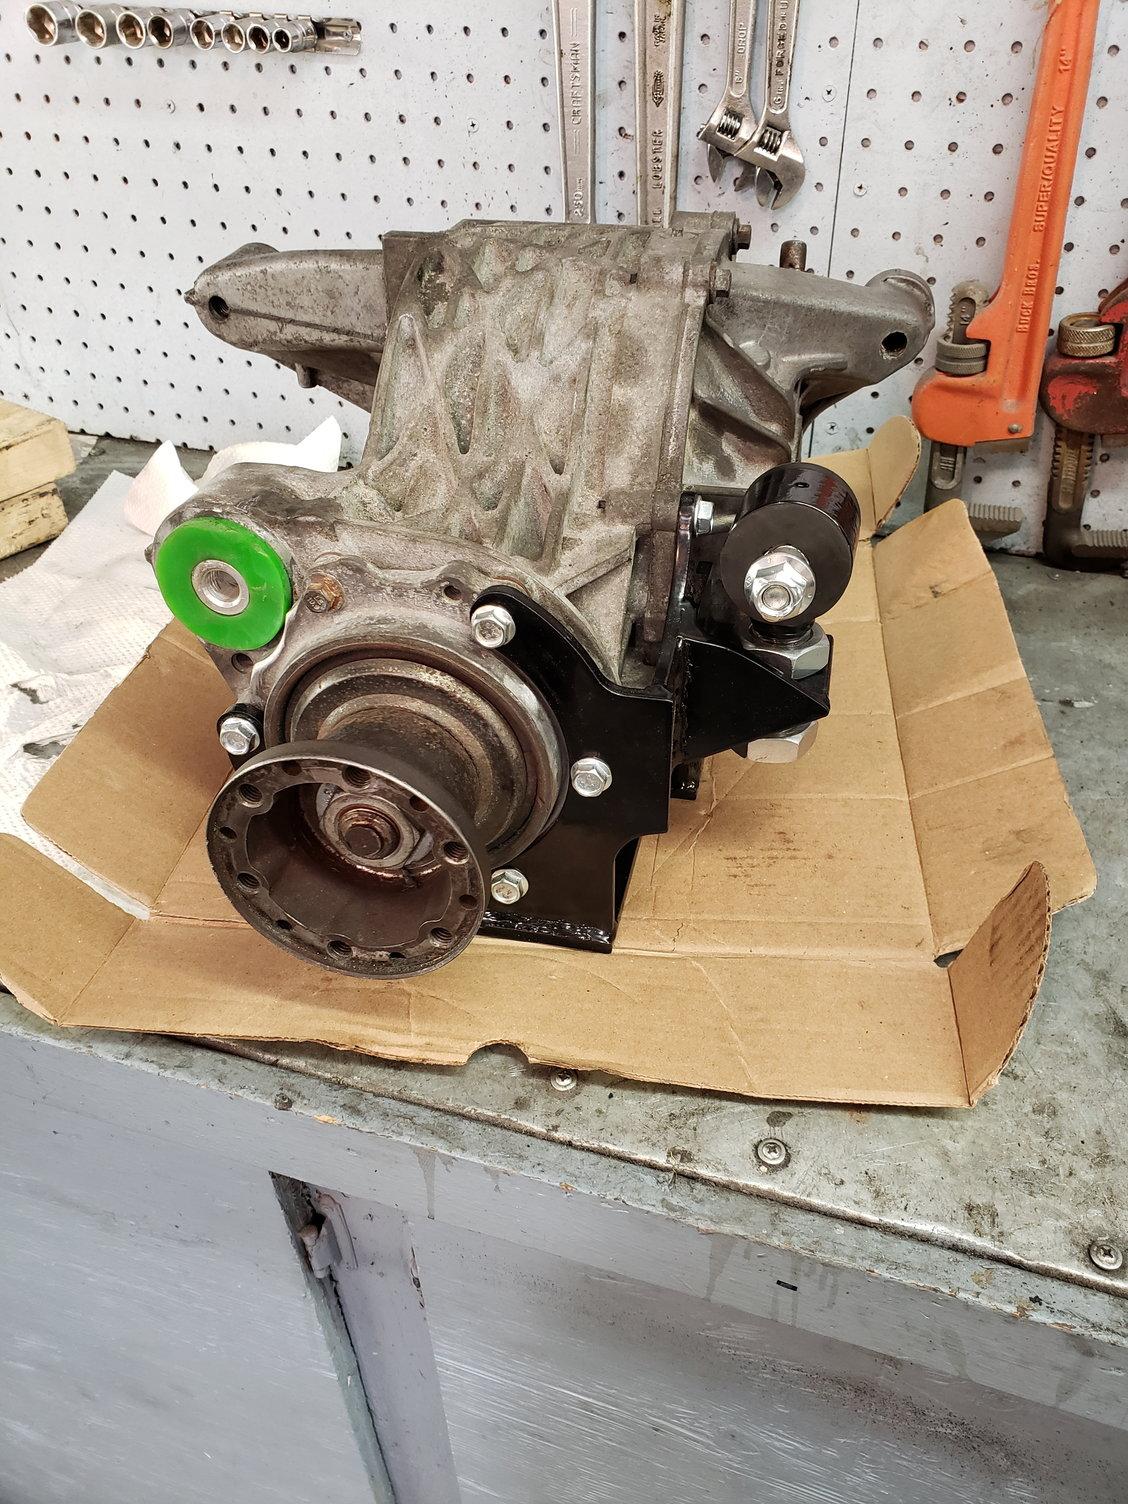 05' CTS-V rear suspension rebuild  - CorvetteForum